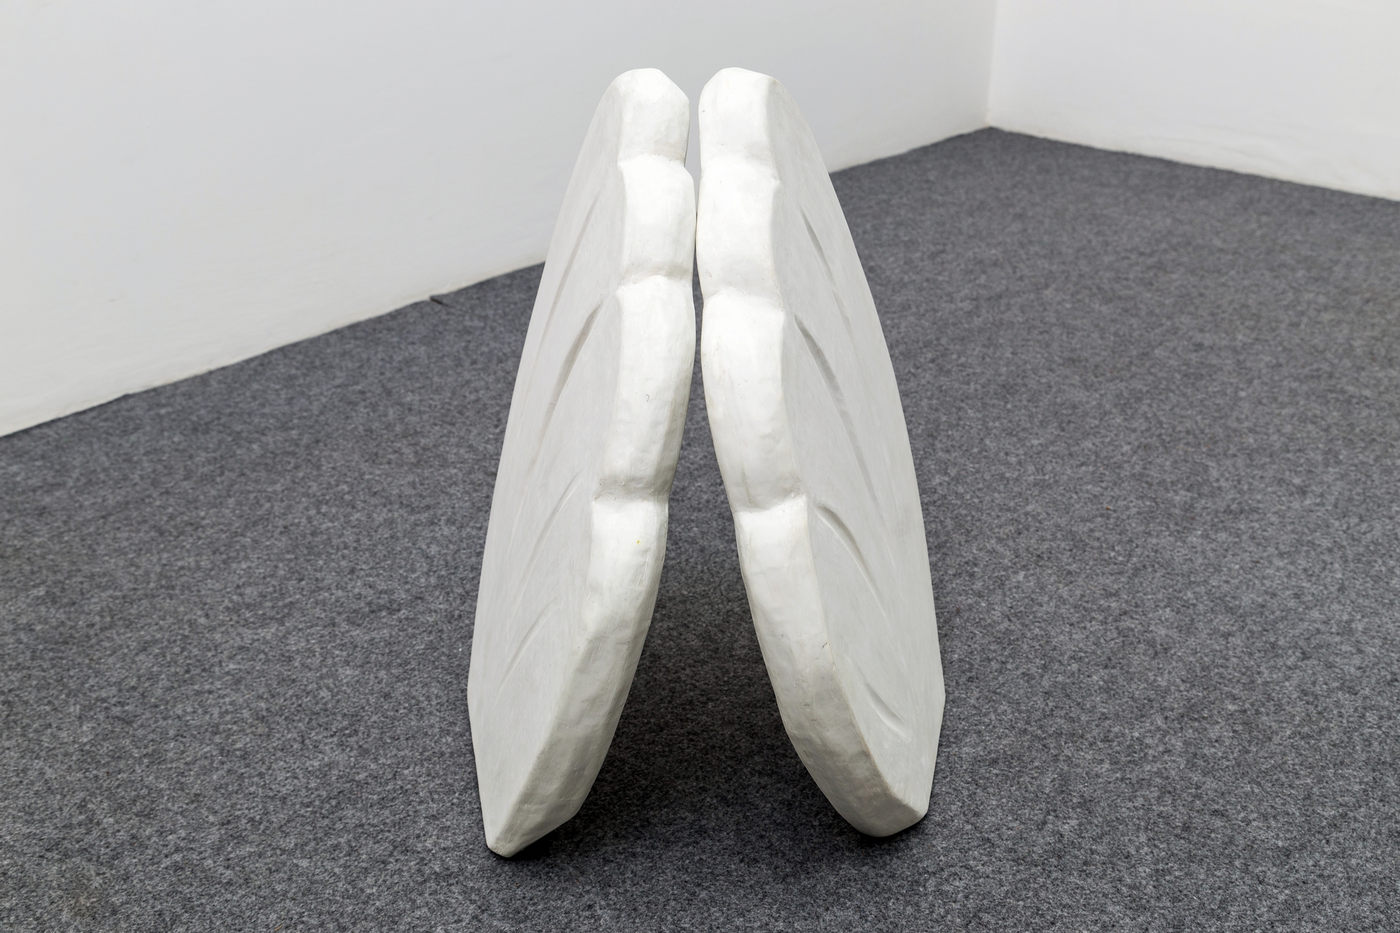 Grant Foster Wings 64x40x40cm 2016 caulk, glue, paper, polystyrene